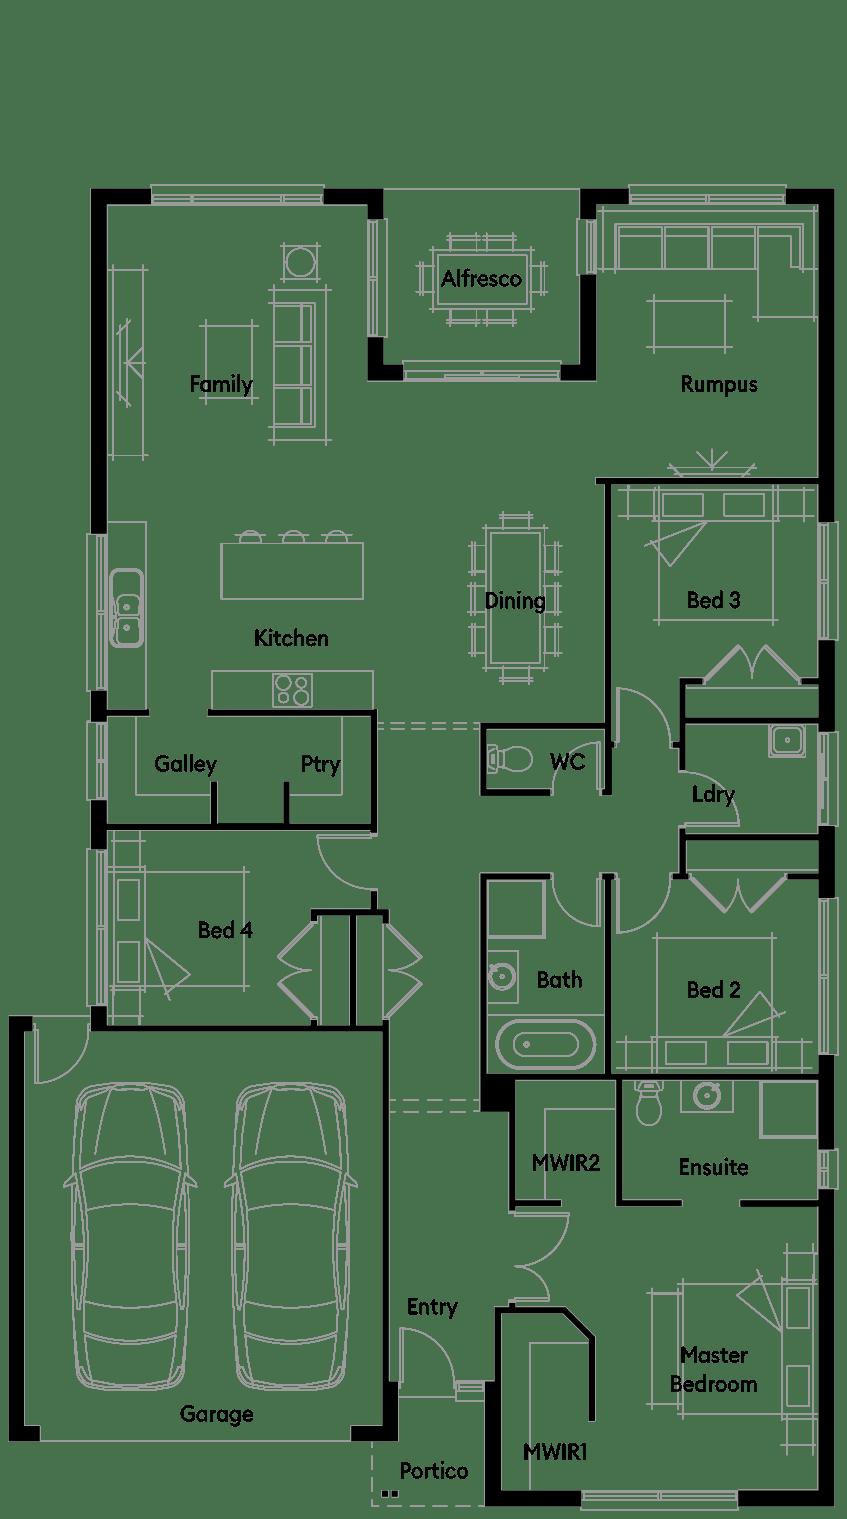 FloorPlan1_HOUSE761_Liverpool_25